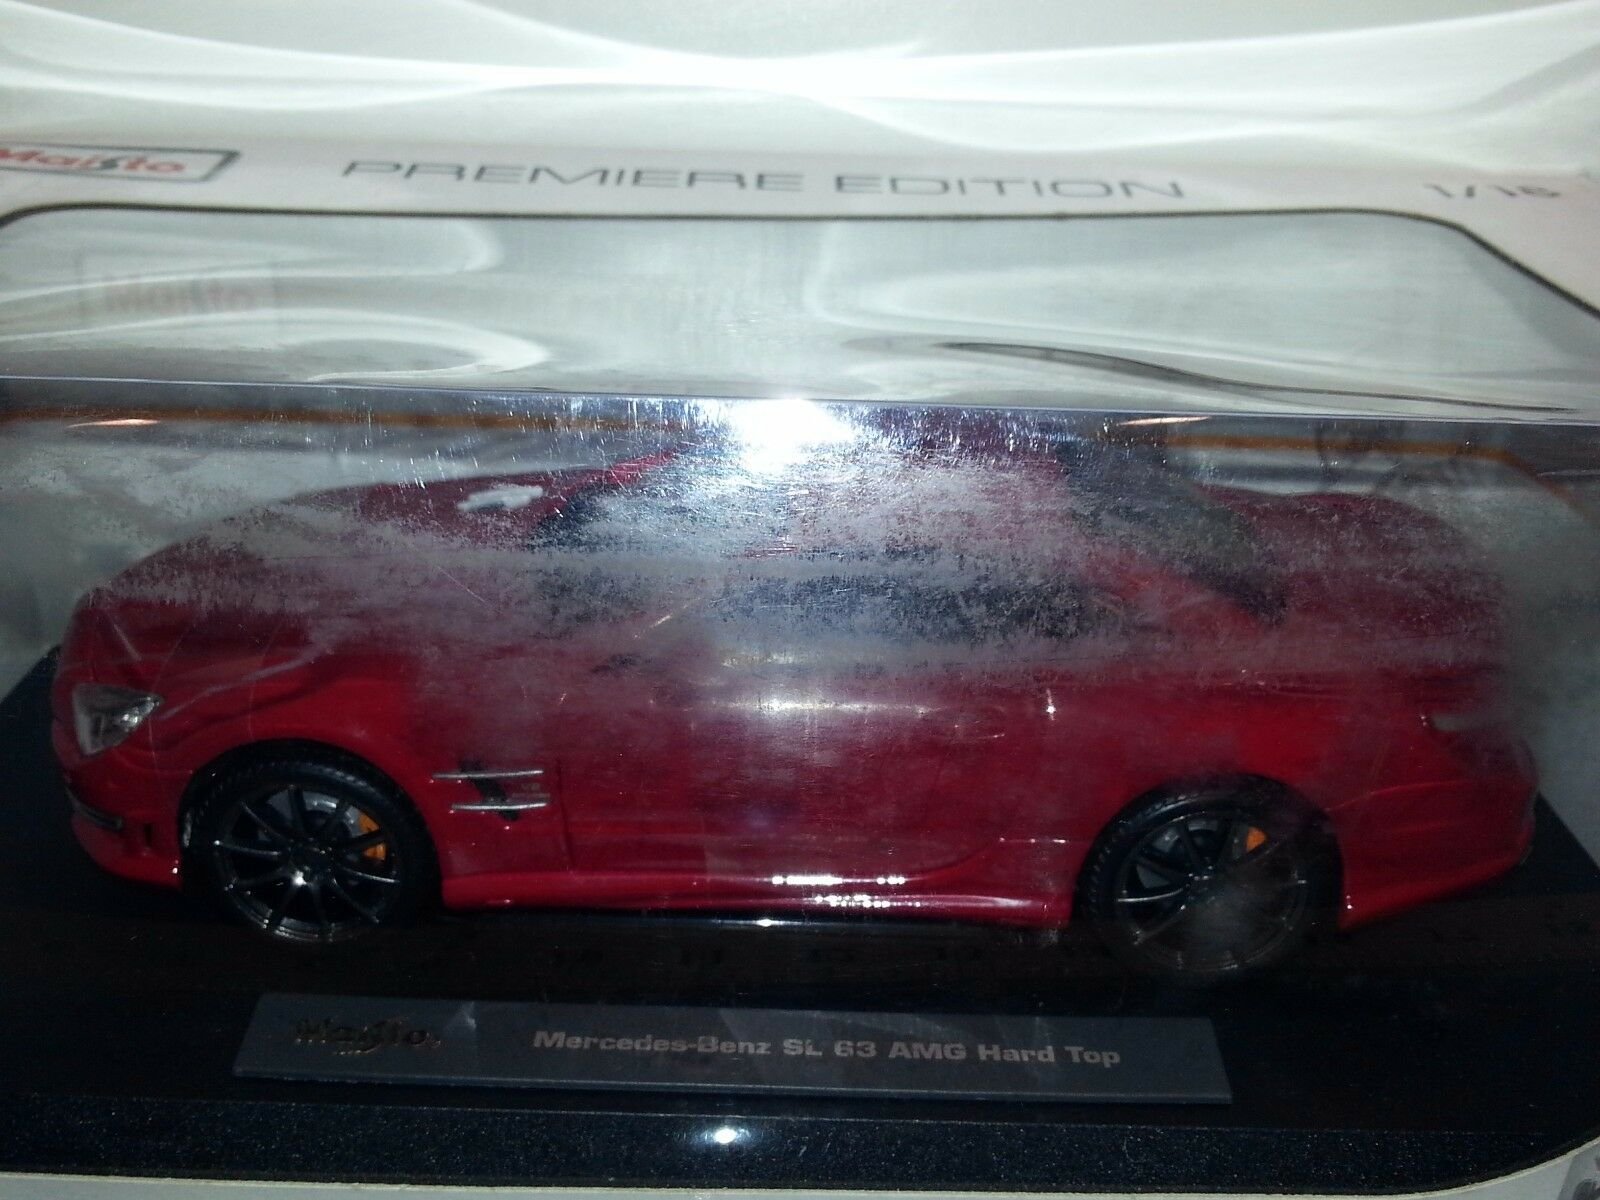 1 18 MAISTO PREMIERE EDITION MERCEDES-BENZ SL 63 AMG HARD TOP RED rd